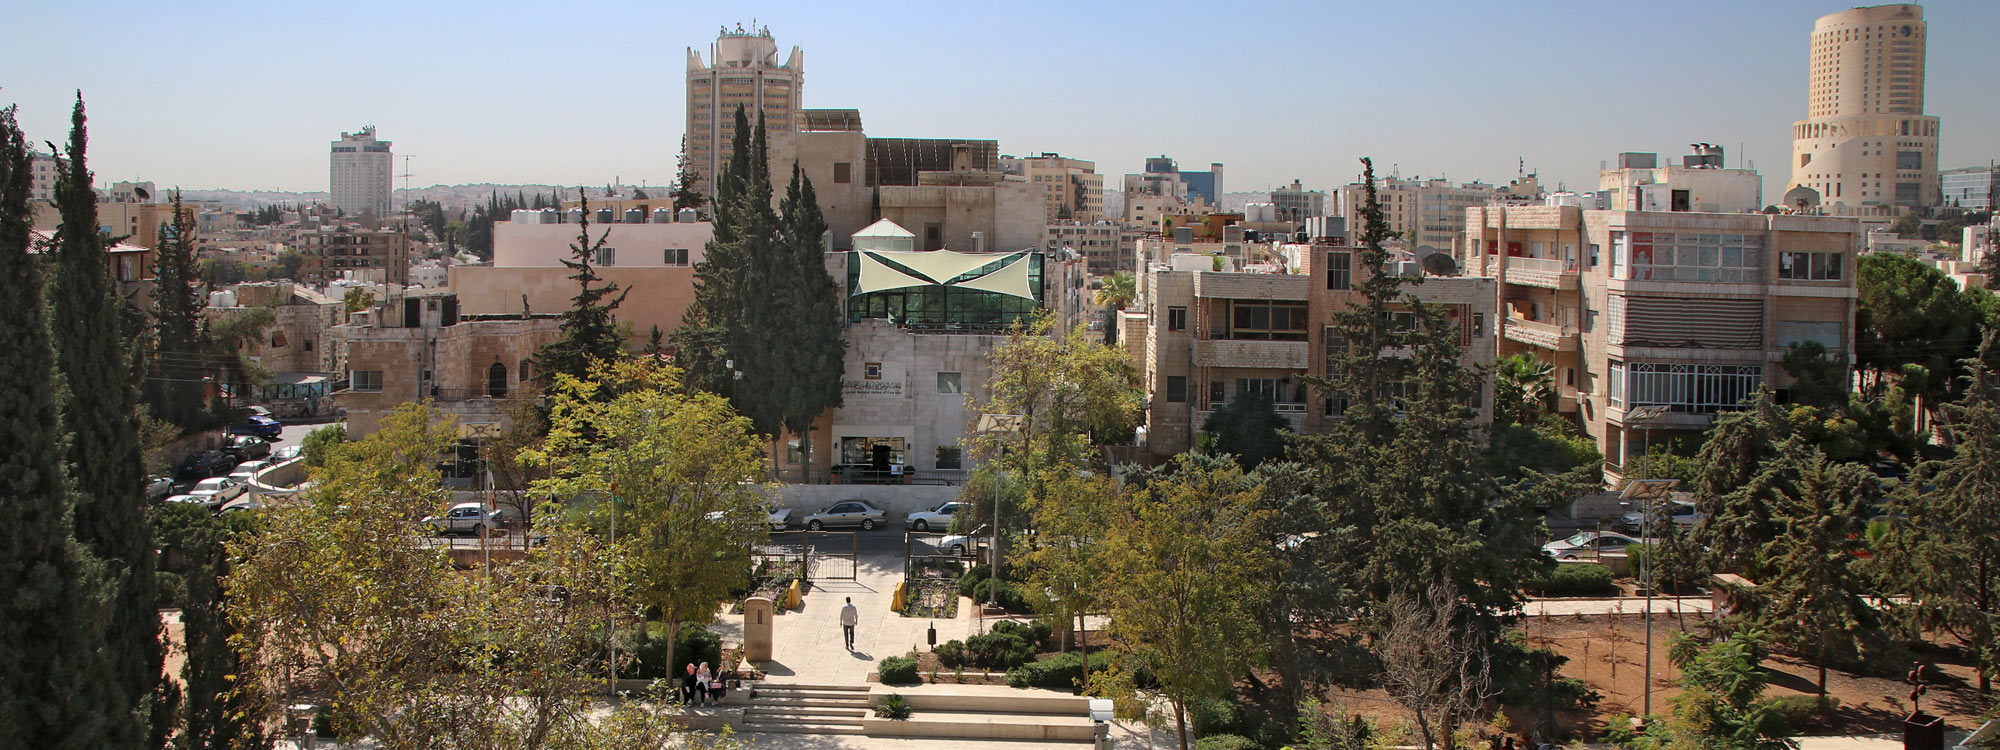 Amman: Contemporary Art & Heritage